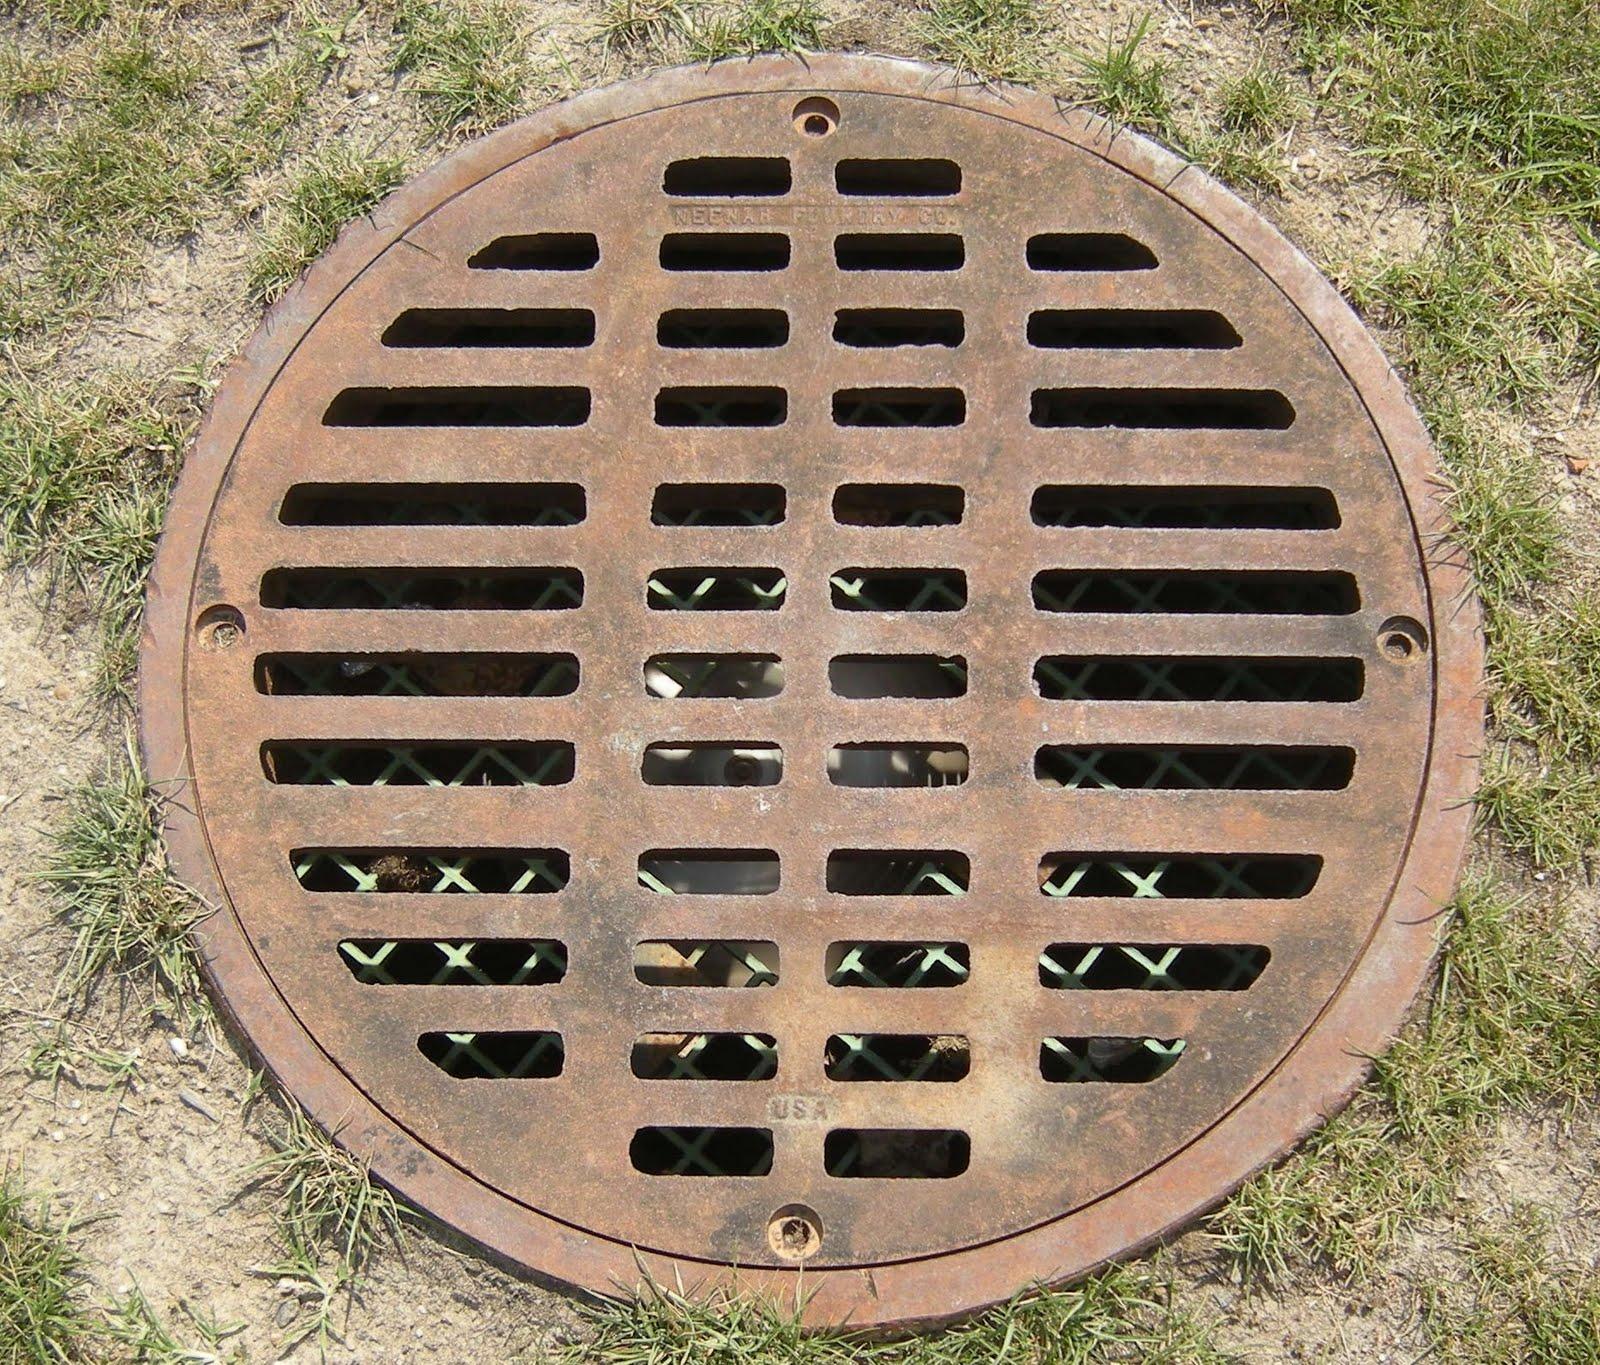 The mathematical tourist manhole cover geometry